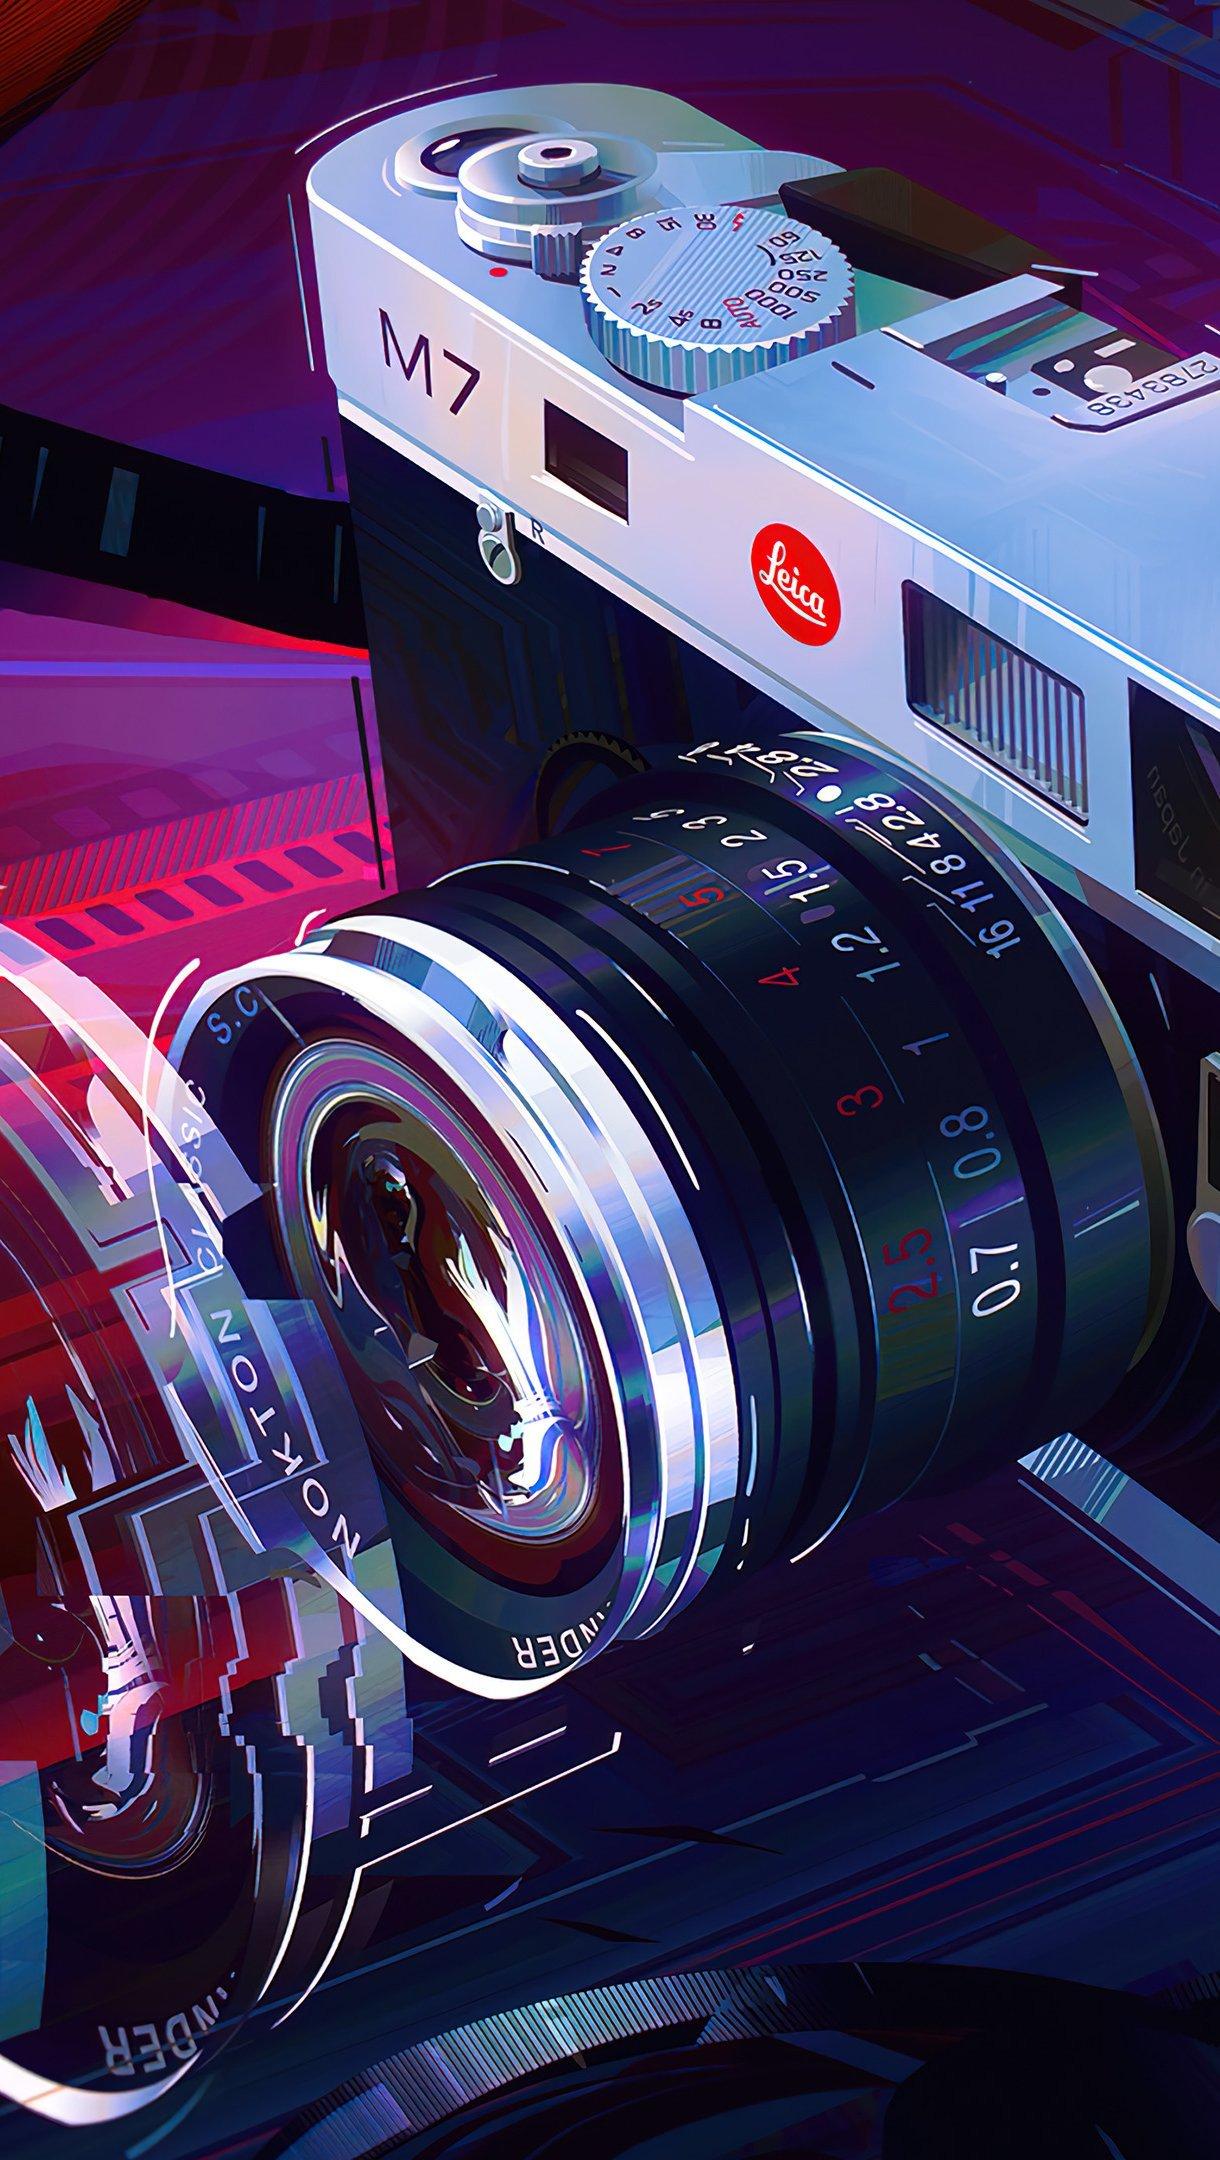 Fondos de pantalla Camara Arte Digital Vertical